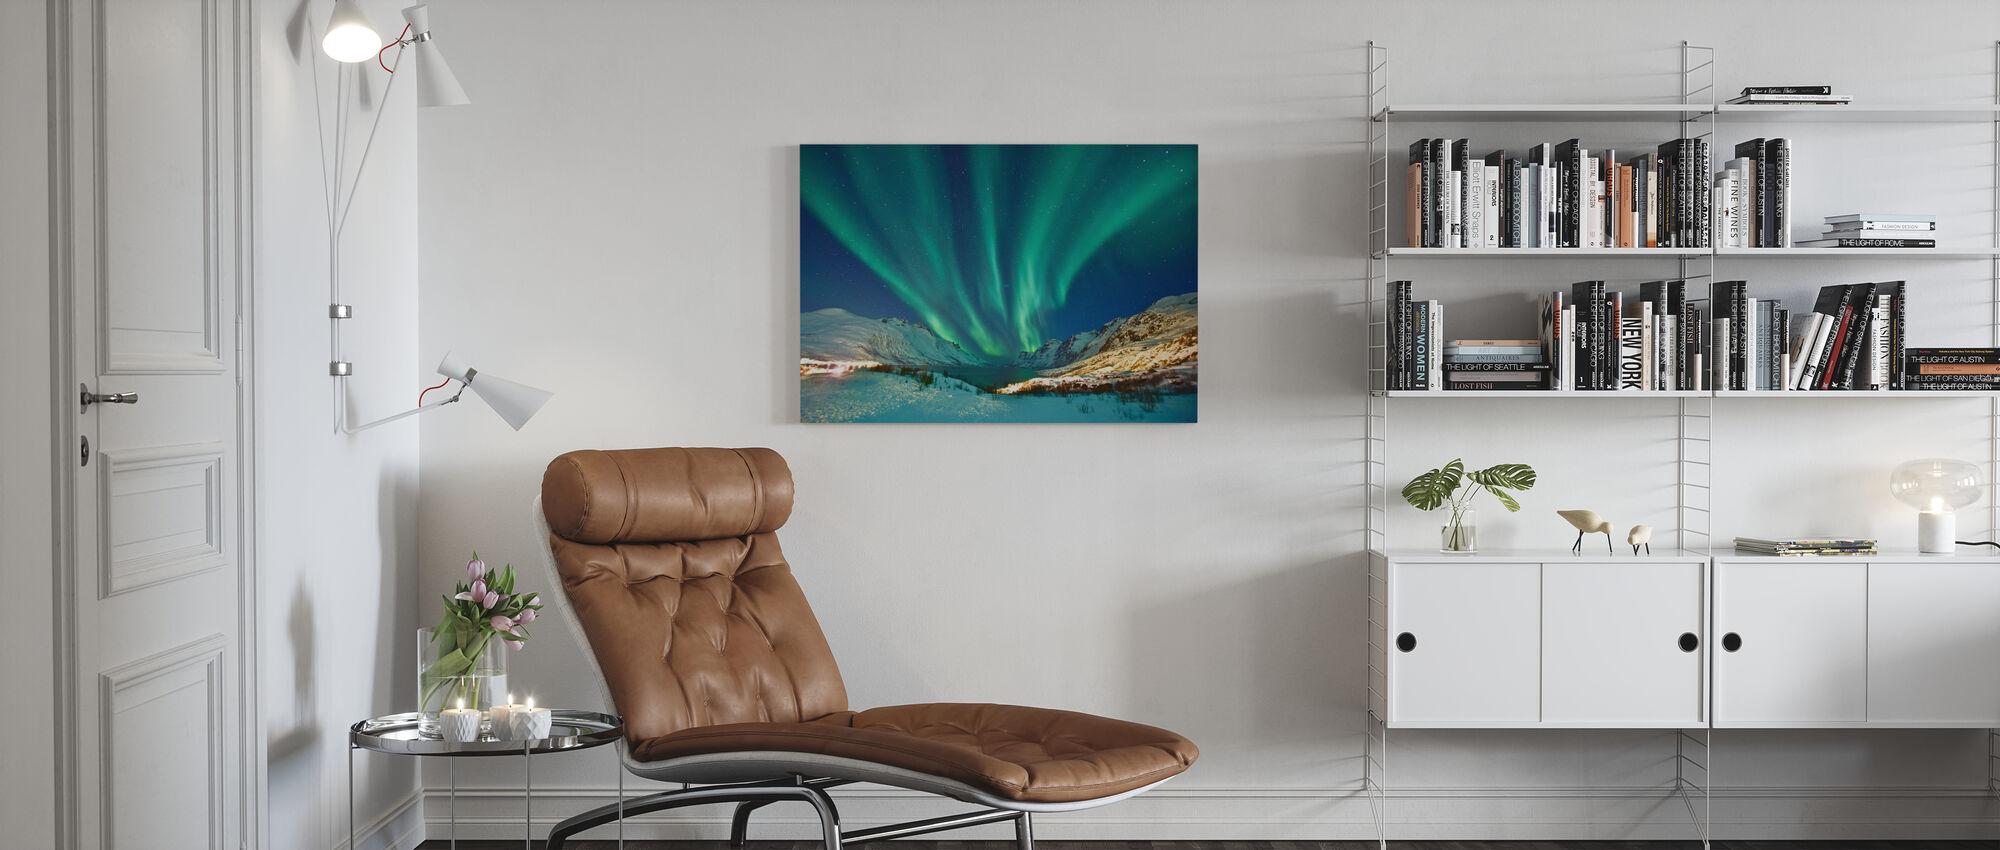 Aurora Borealis - Canvastavla - Vardagsrum